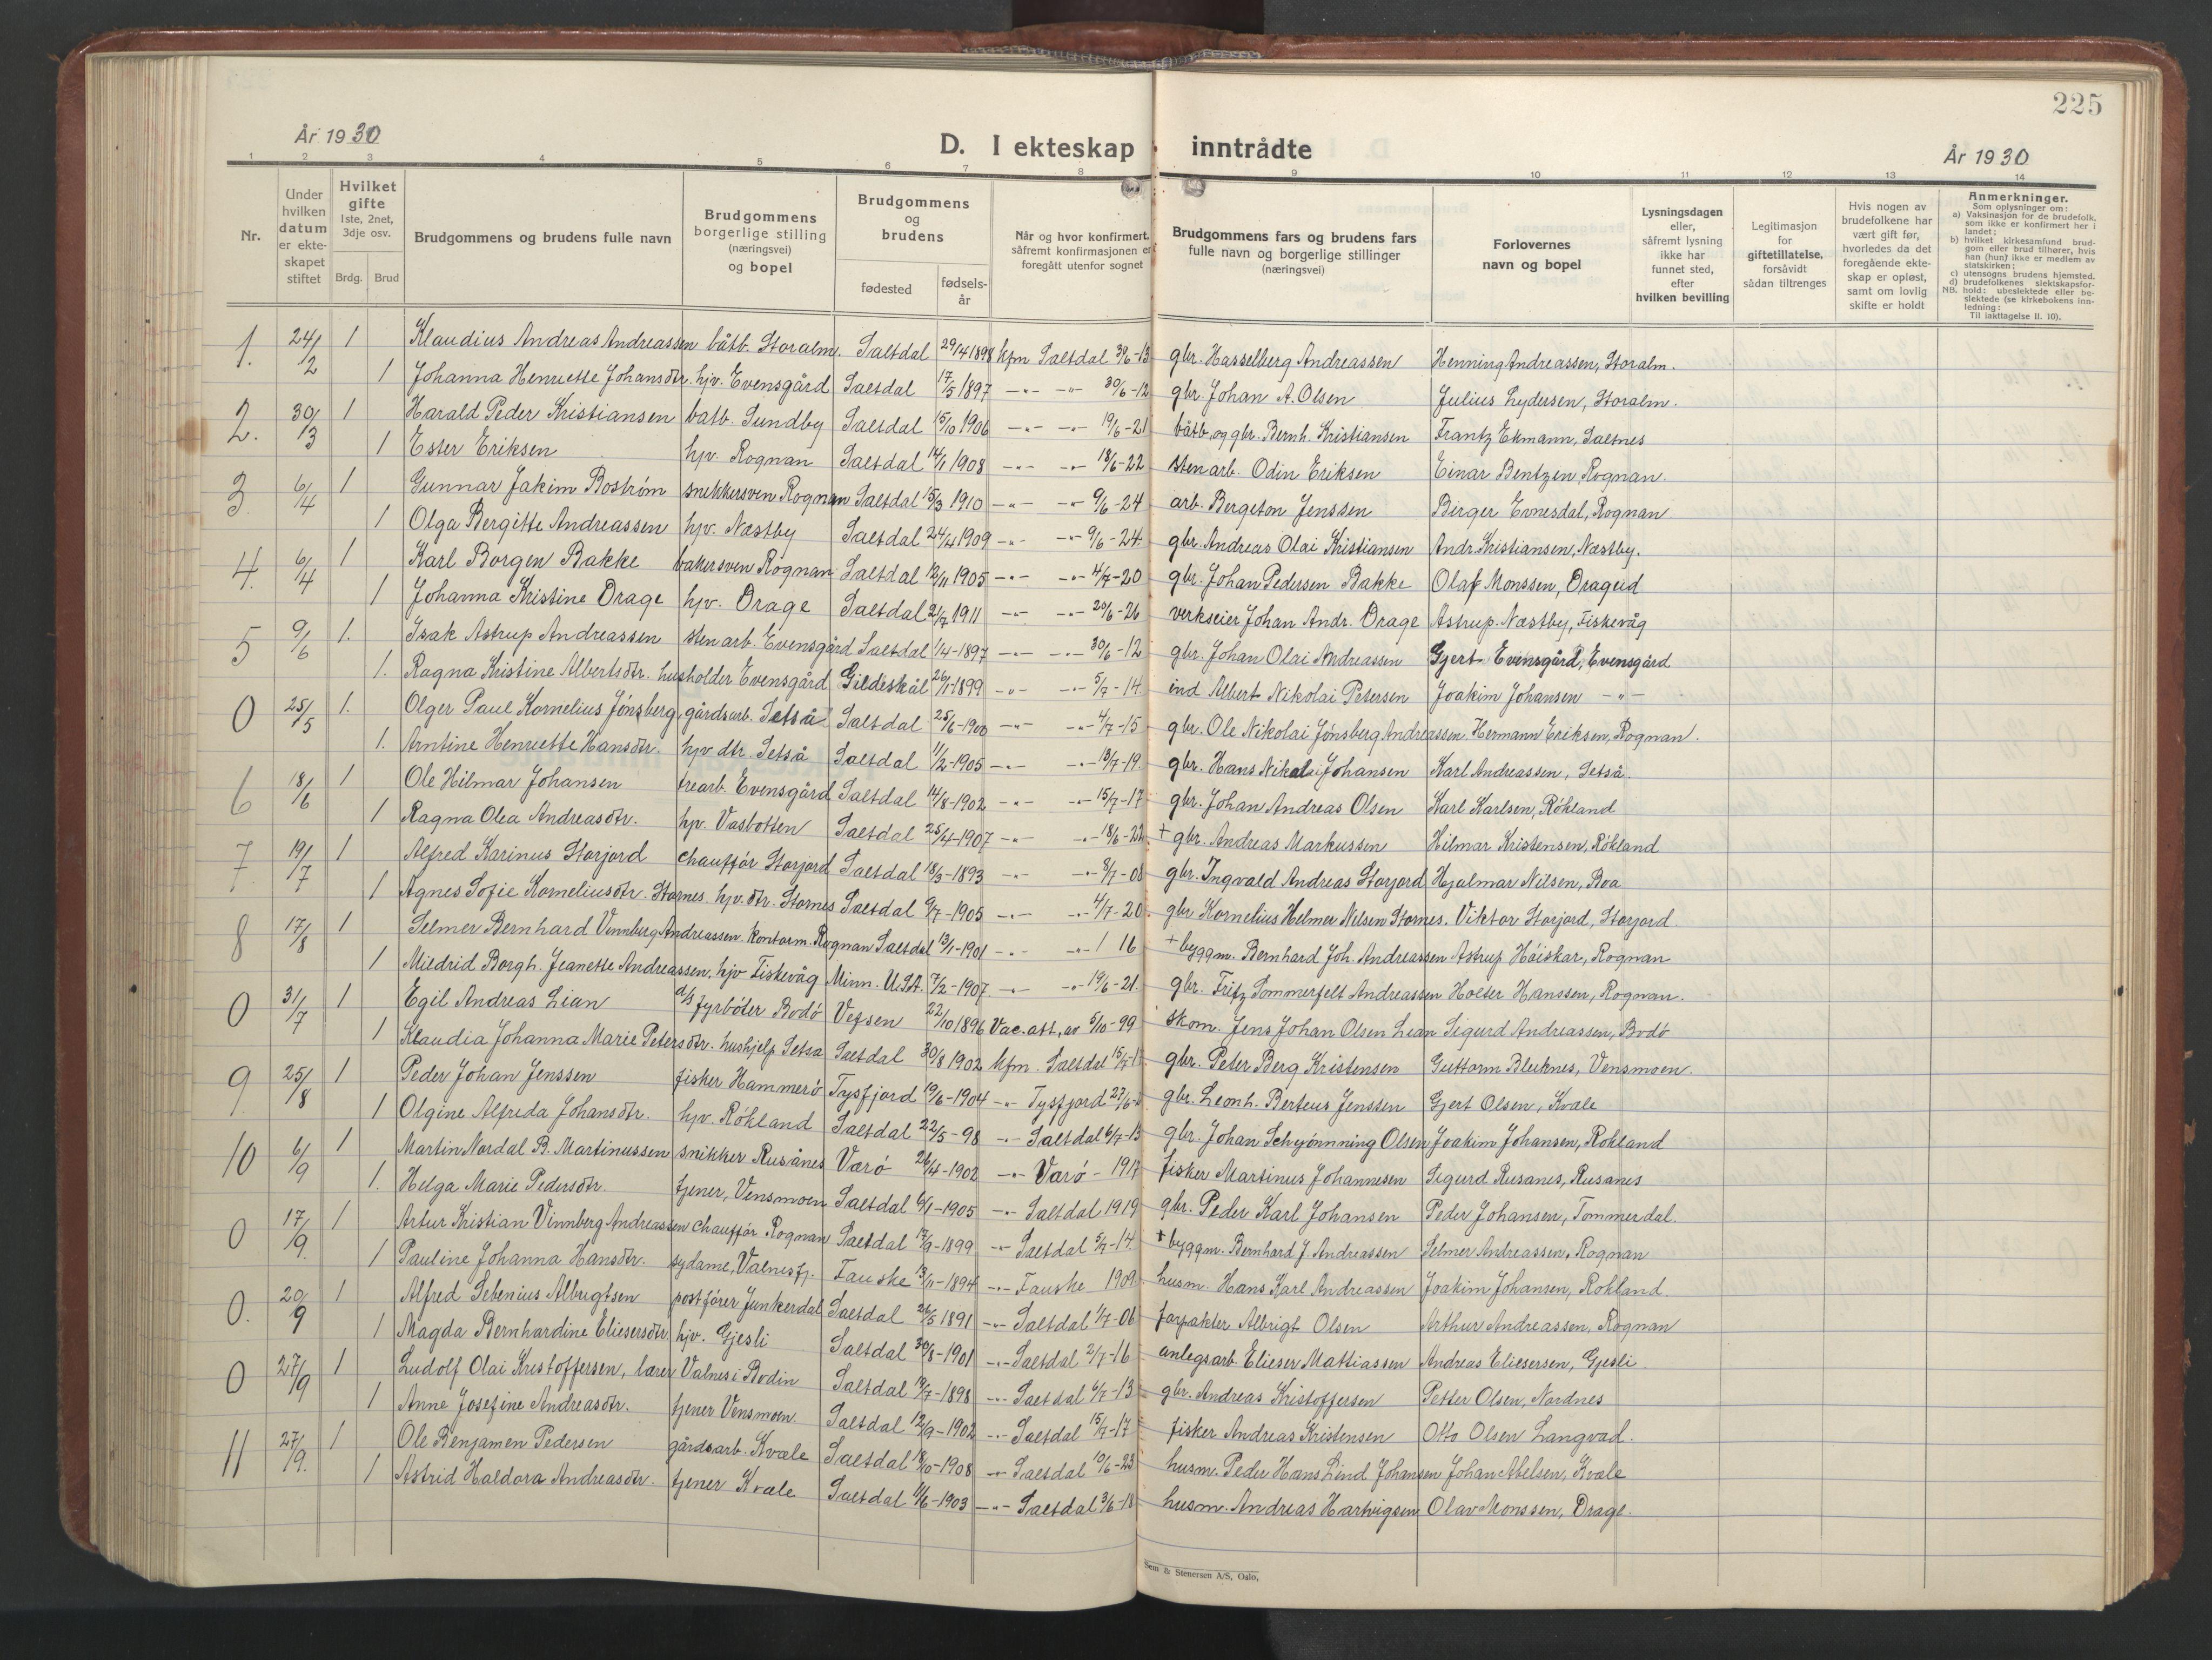 SAT, Ministerialprotokoller, klokkerbøker og fødselsregistre - Nordland, 847/L0680: Klokkerbok nr. 847C08, 1930-1947, s. 225